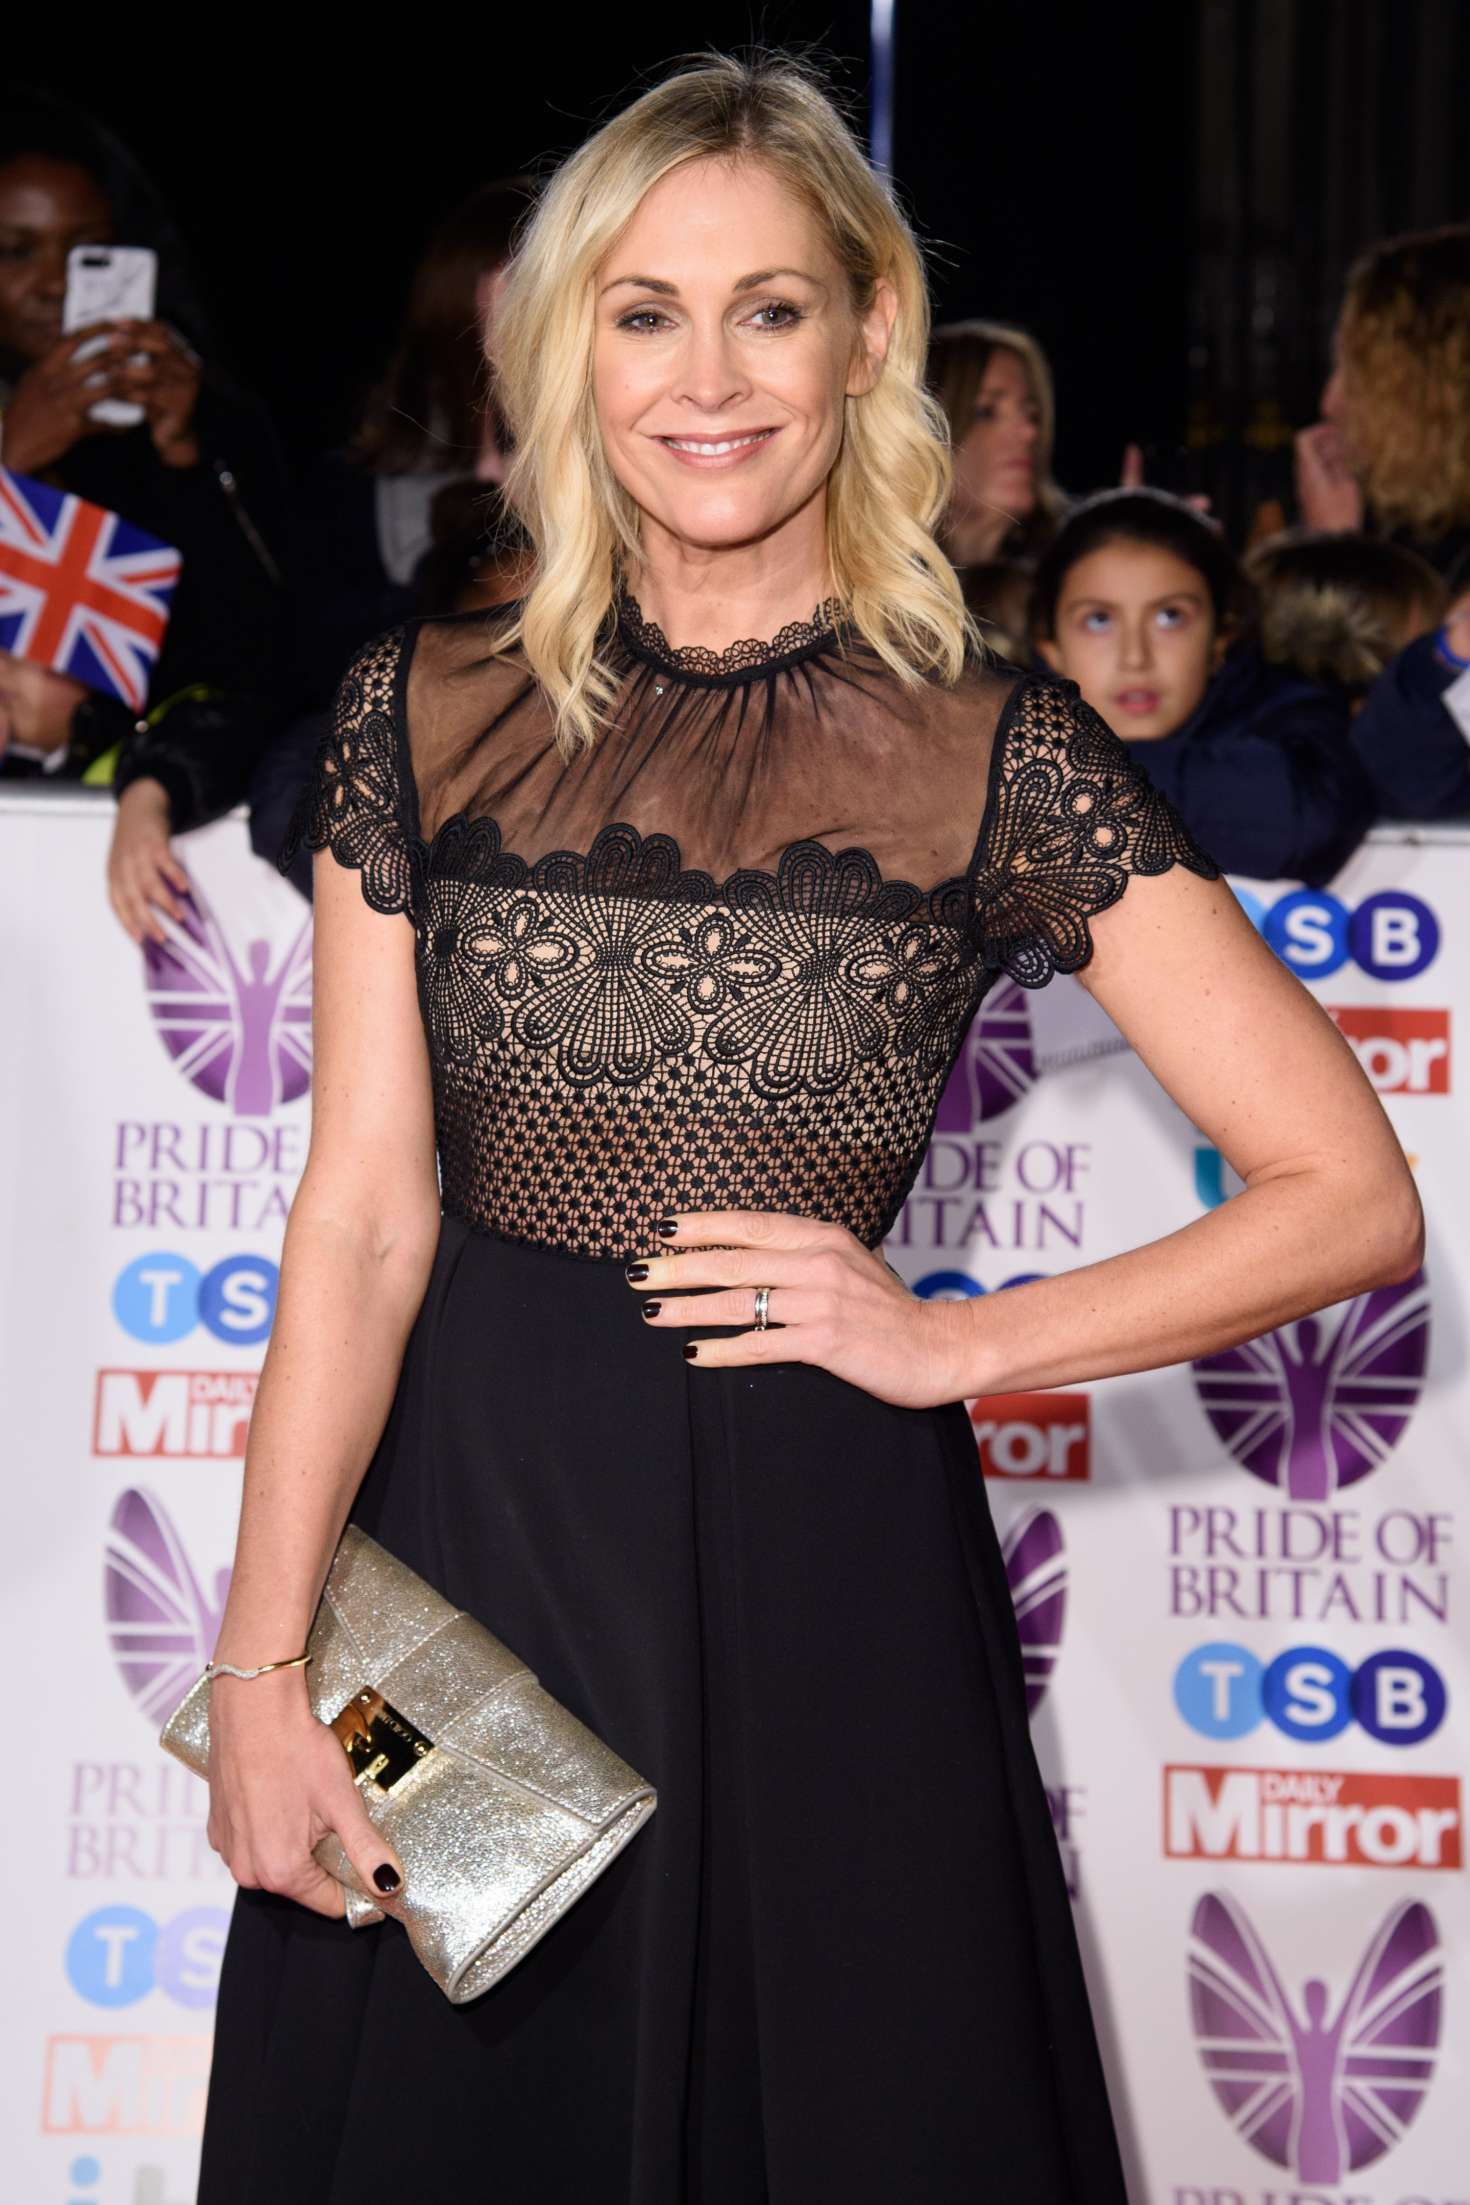 Jenni Falconer - 2017 Pride Of Britain Awards in London